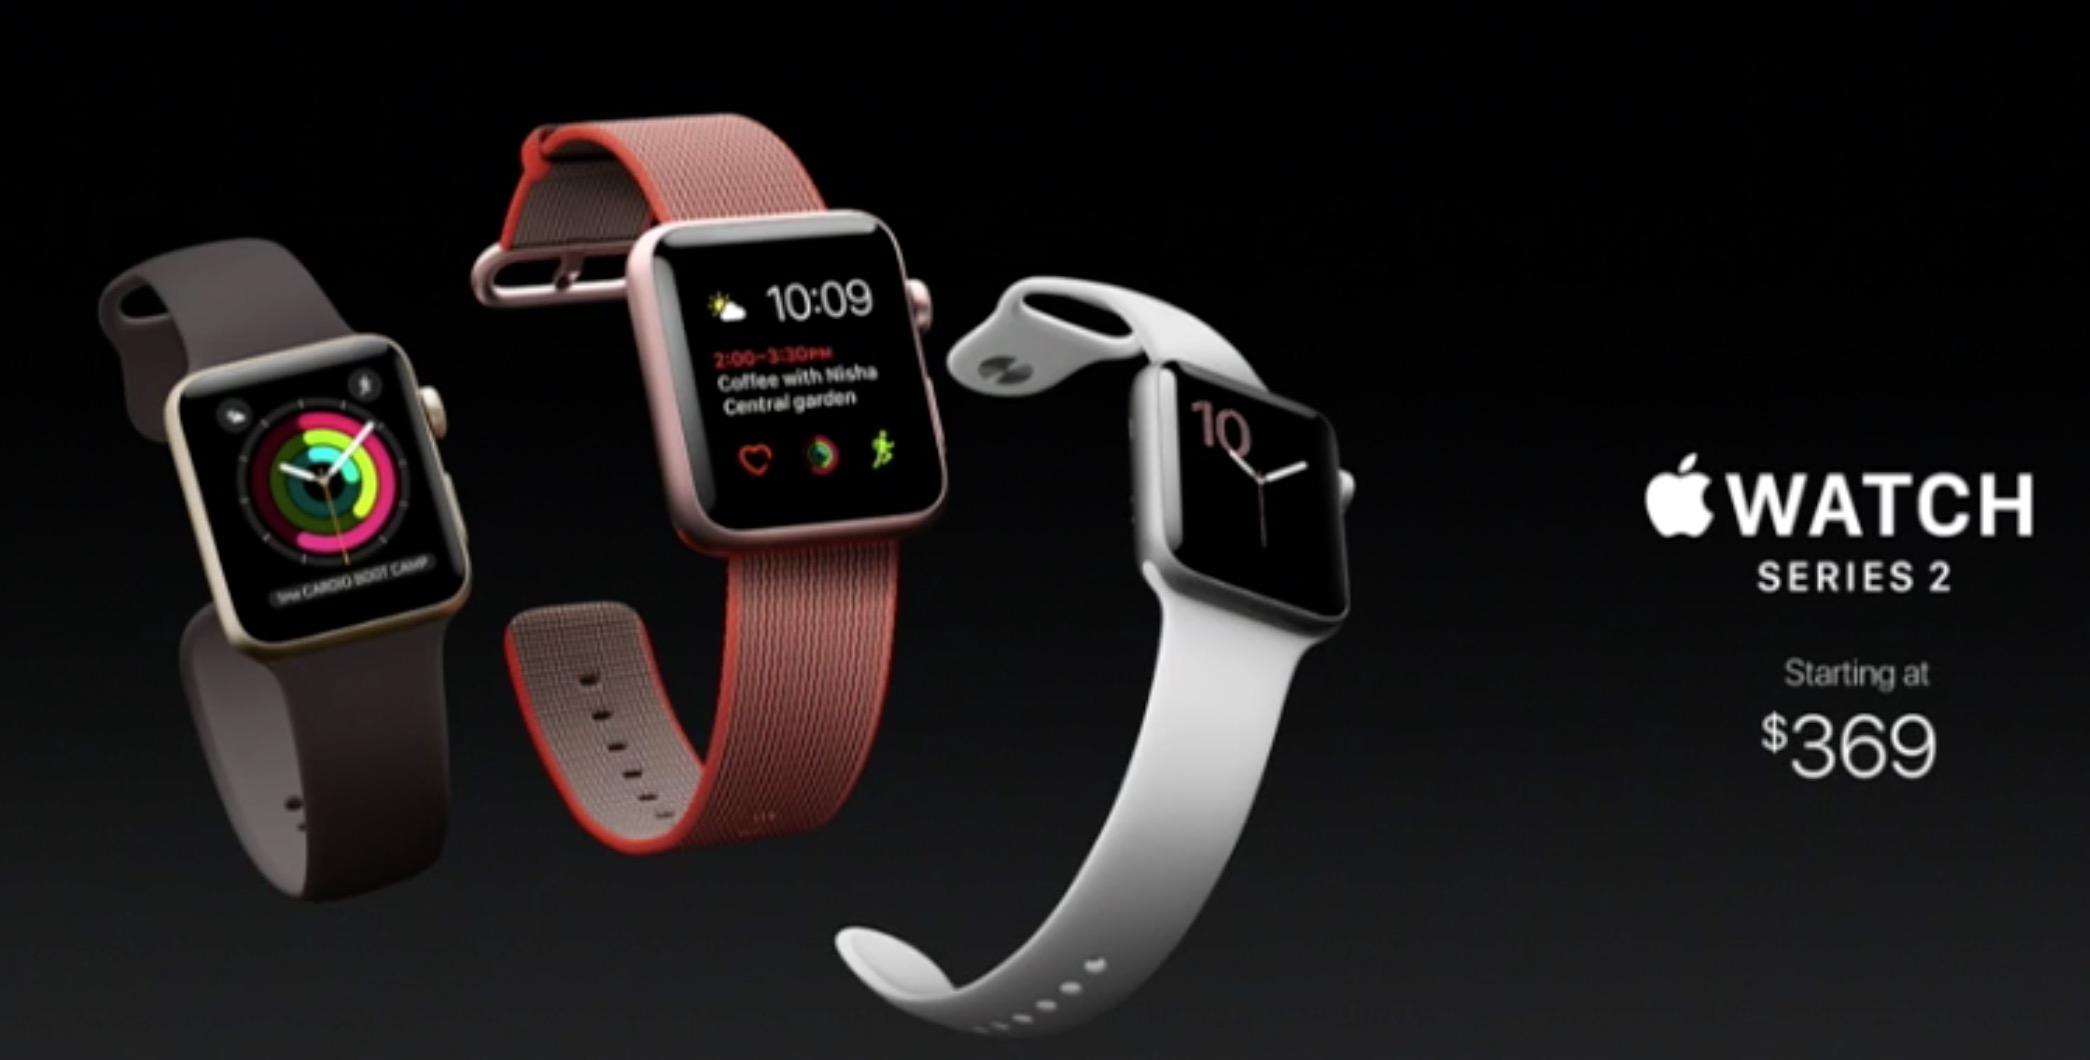 Apple Watch 2 prezzo